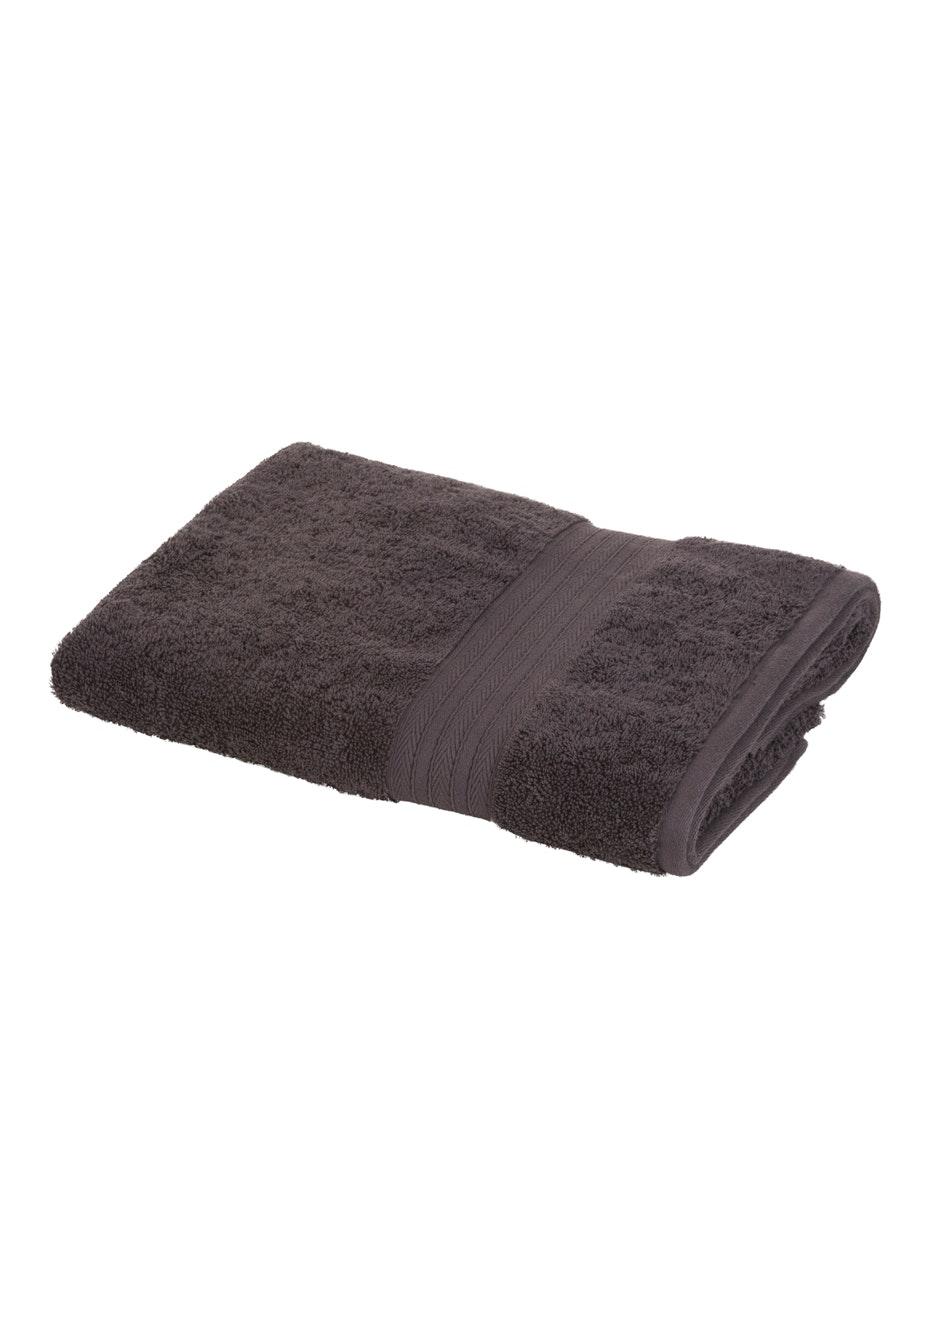 Morrissey Designer Egyptian Bath Towel Steel